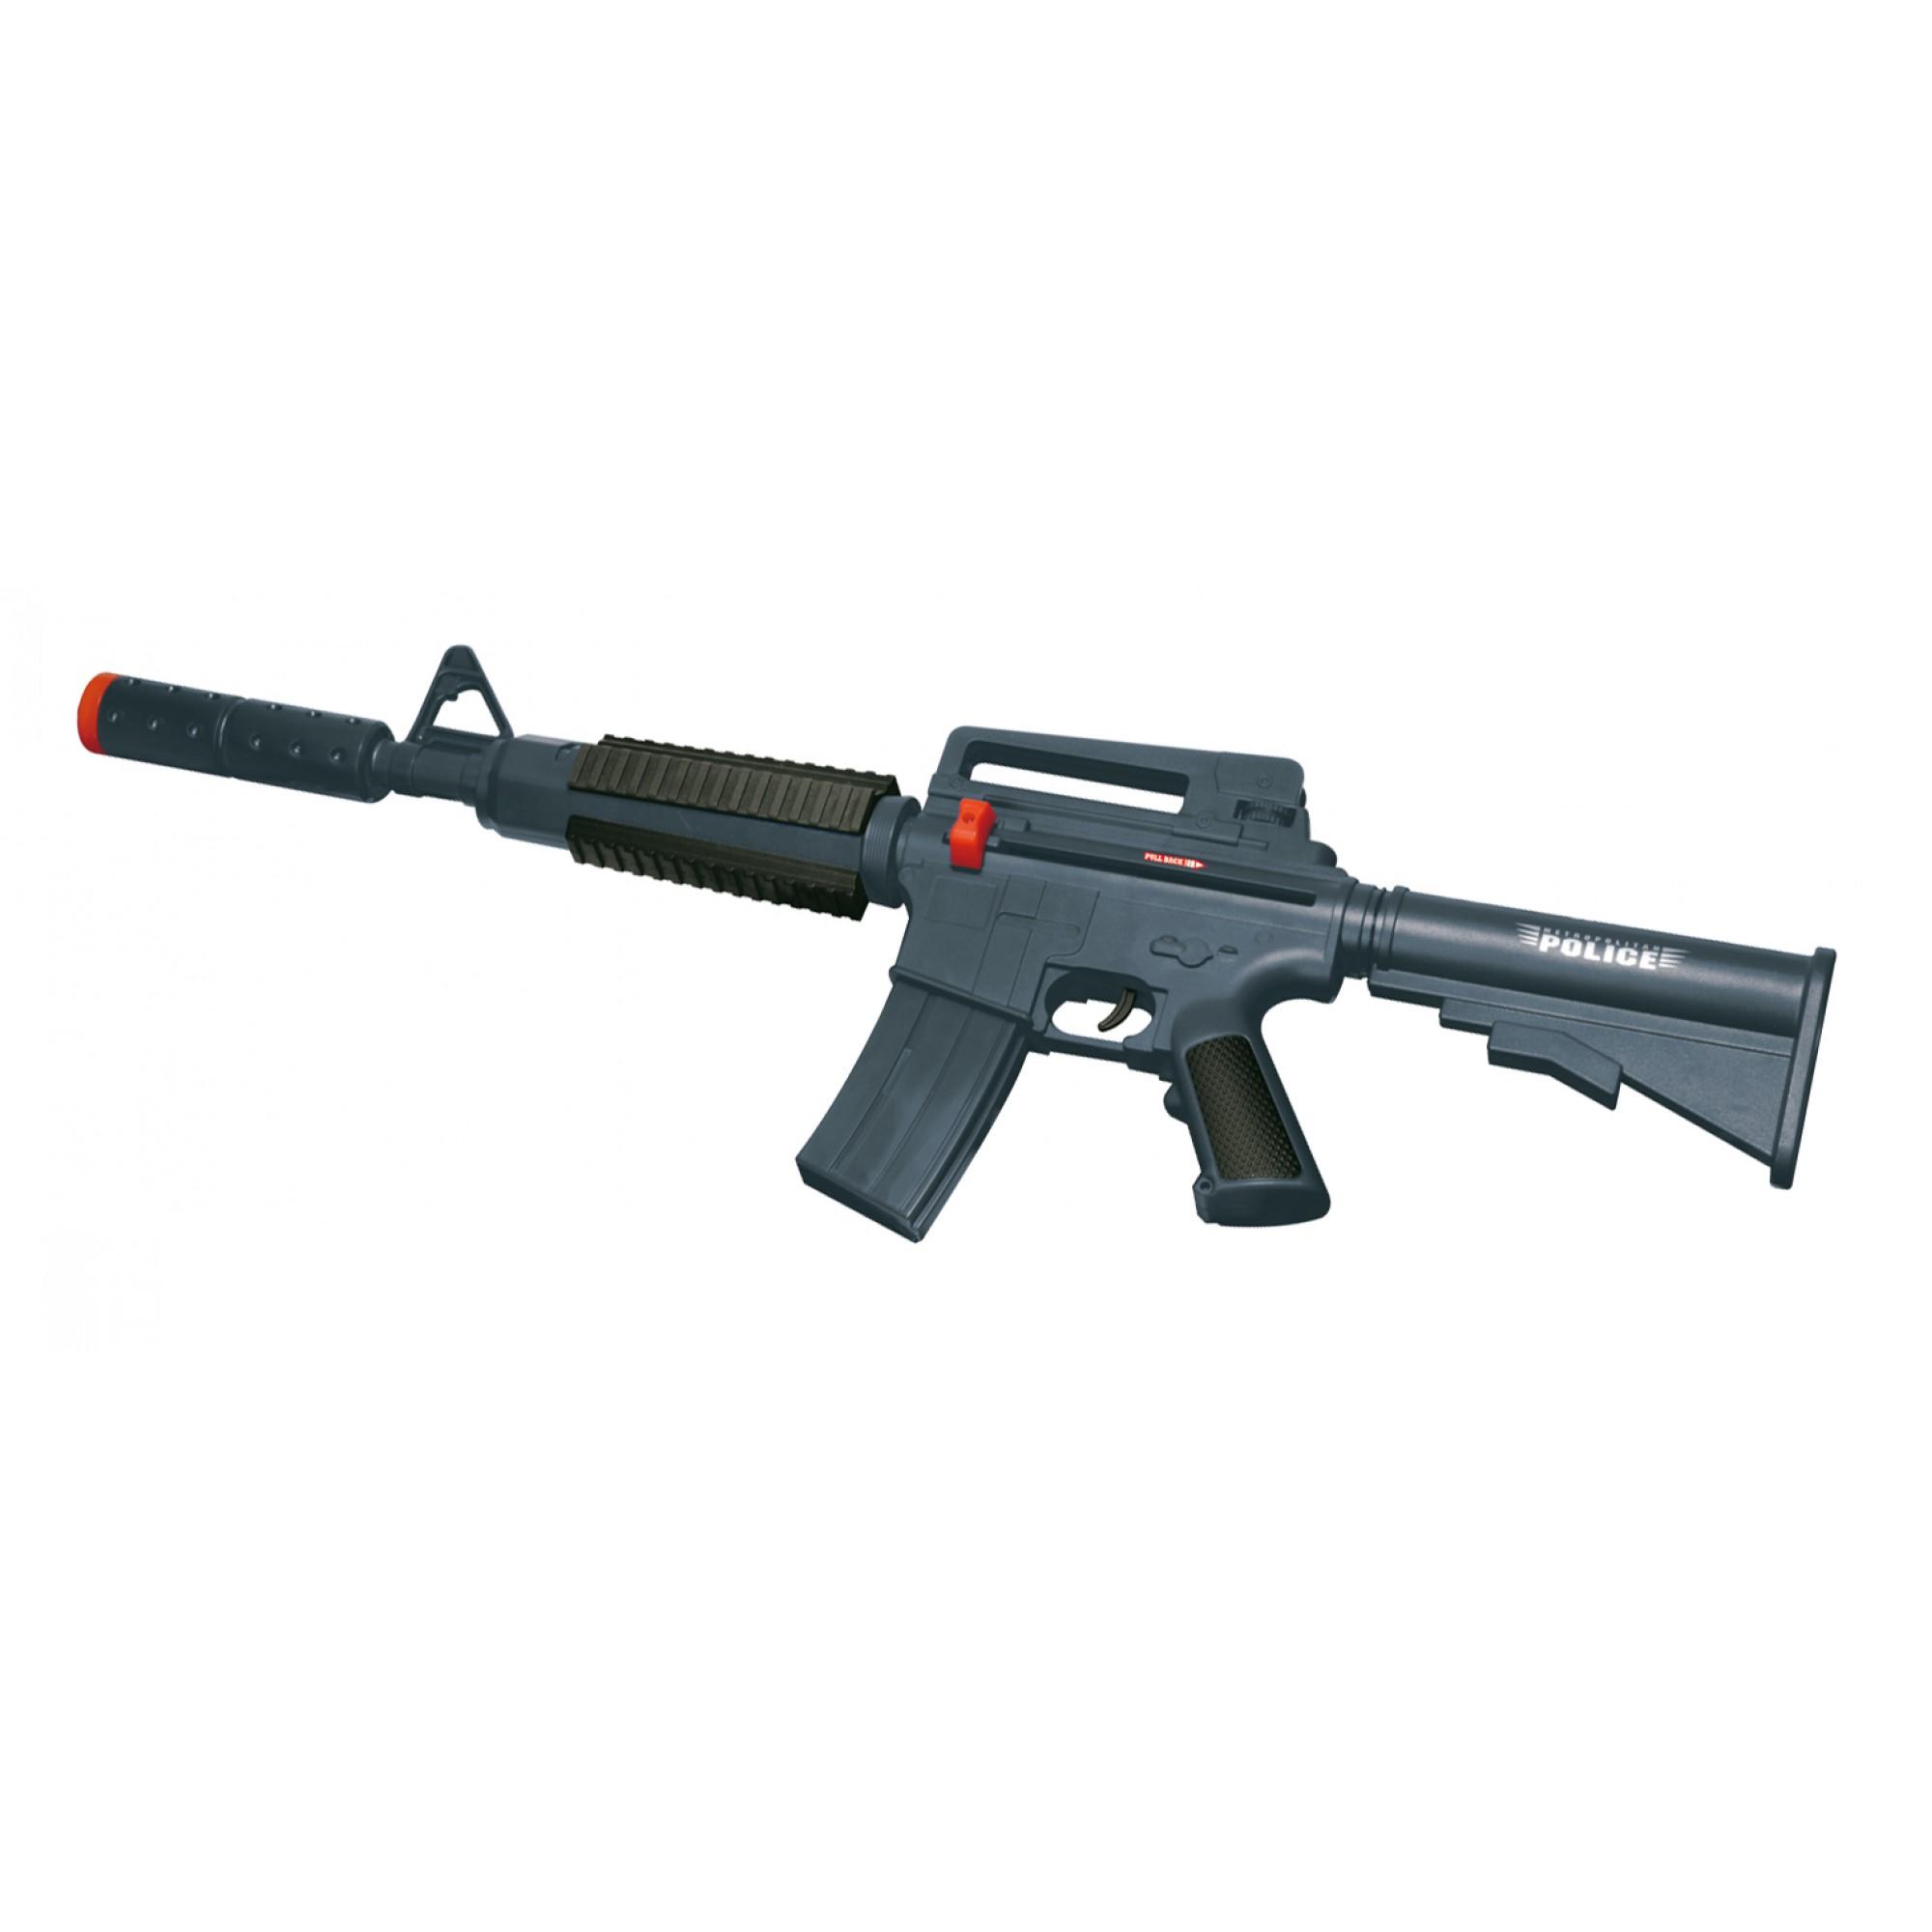 Machine Gun (M16)